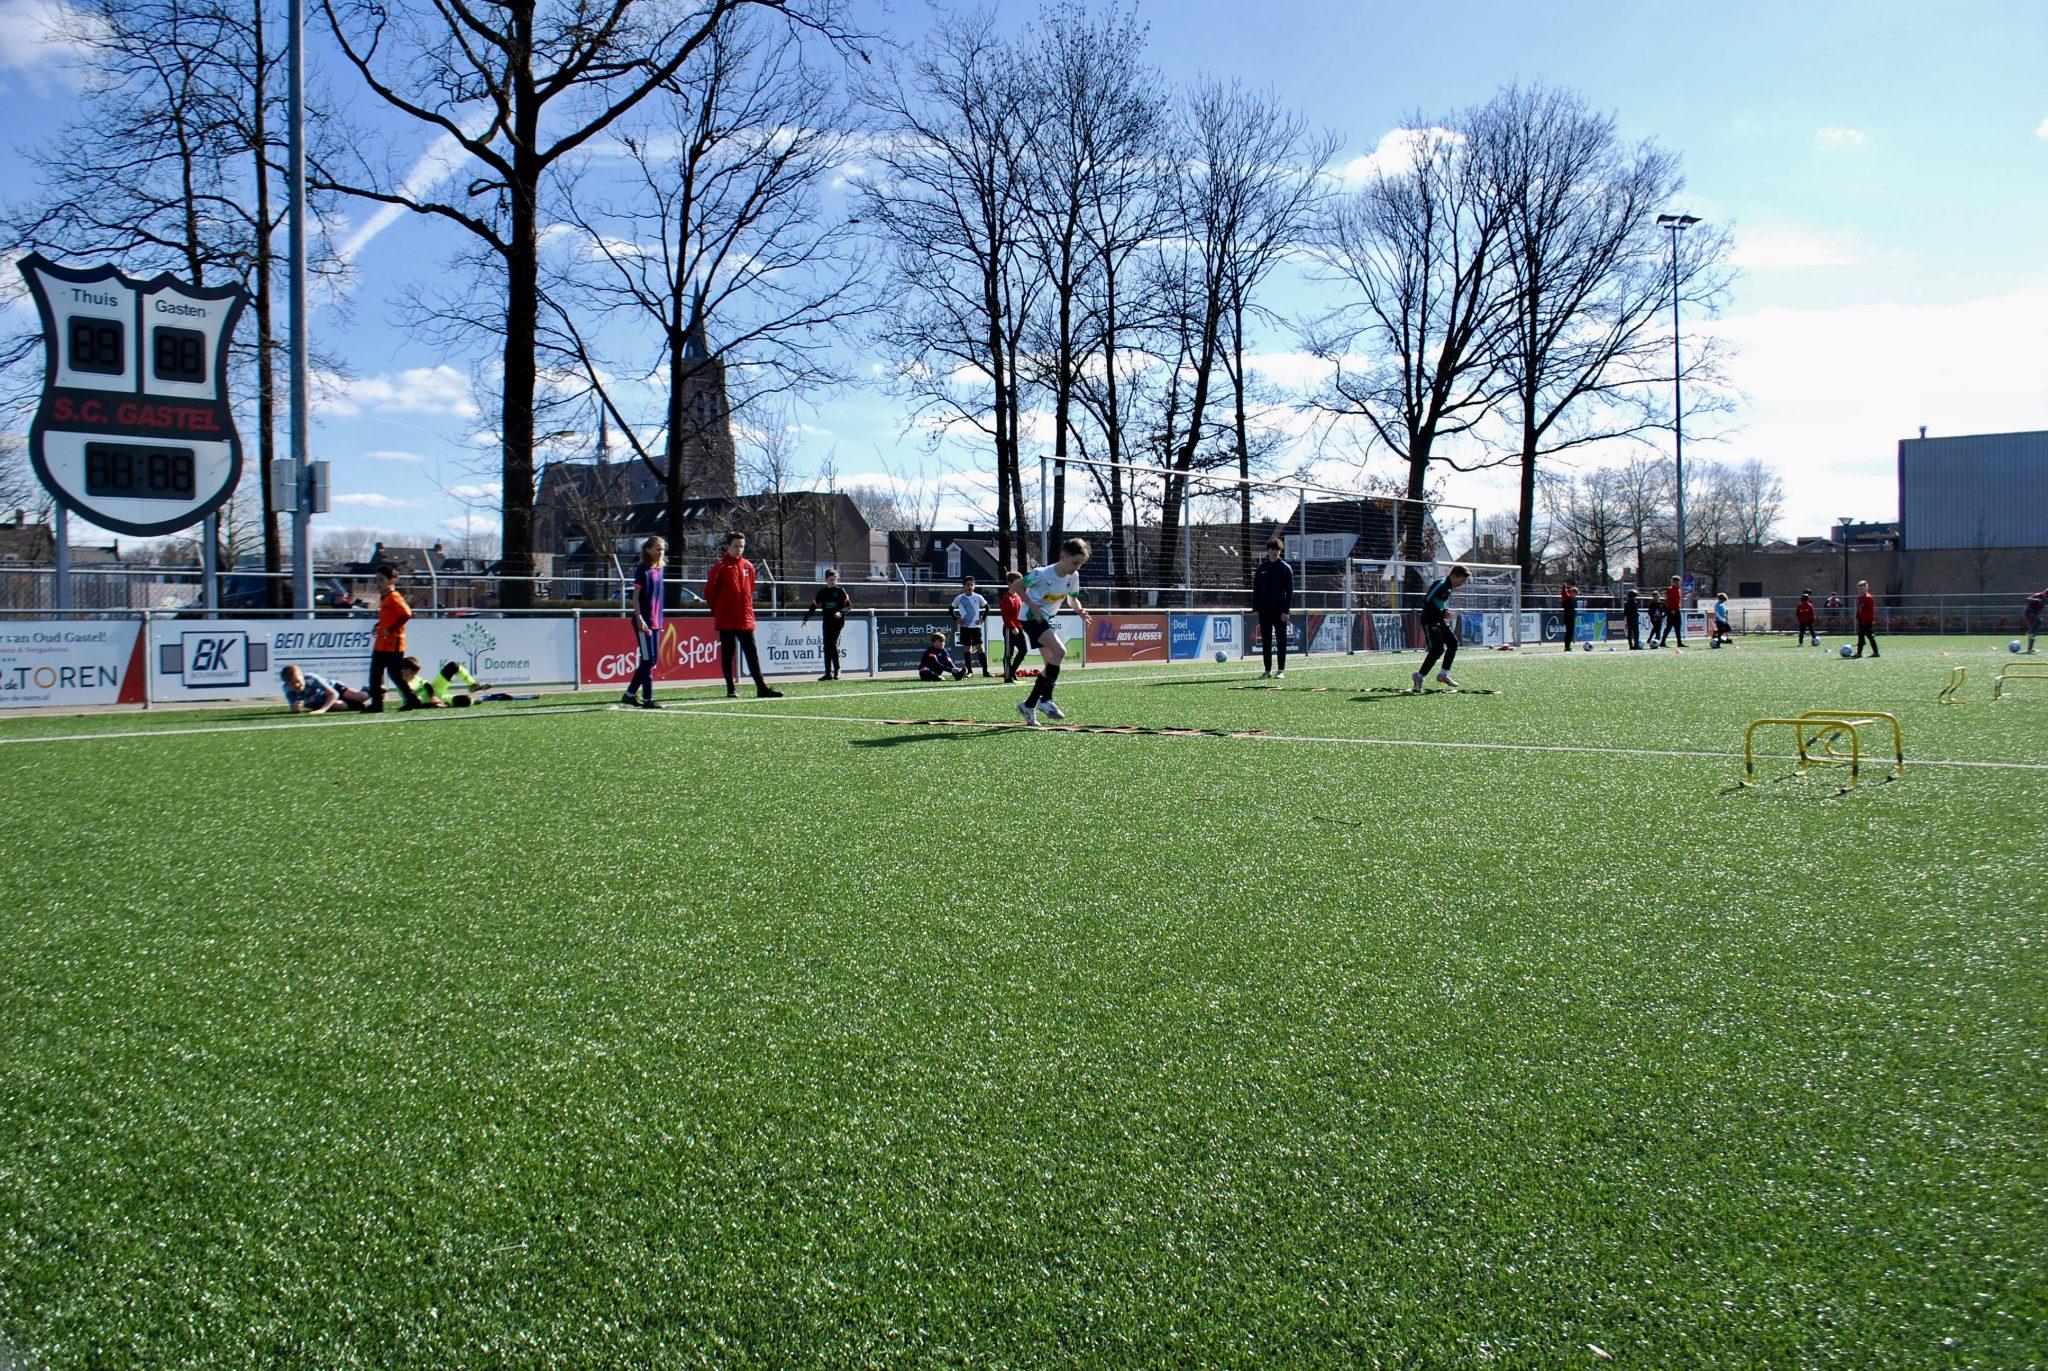 Voetbalschooldag bij SC Gastel groot succes.